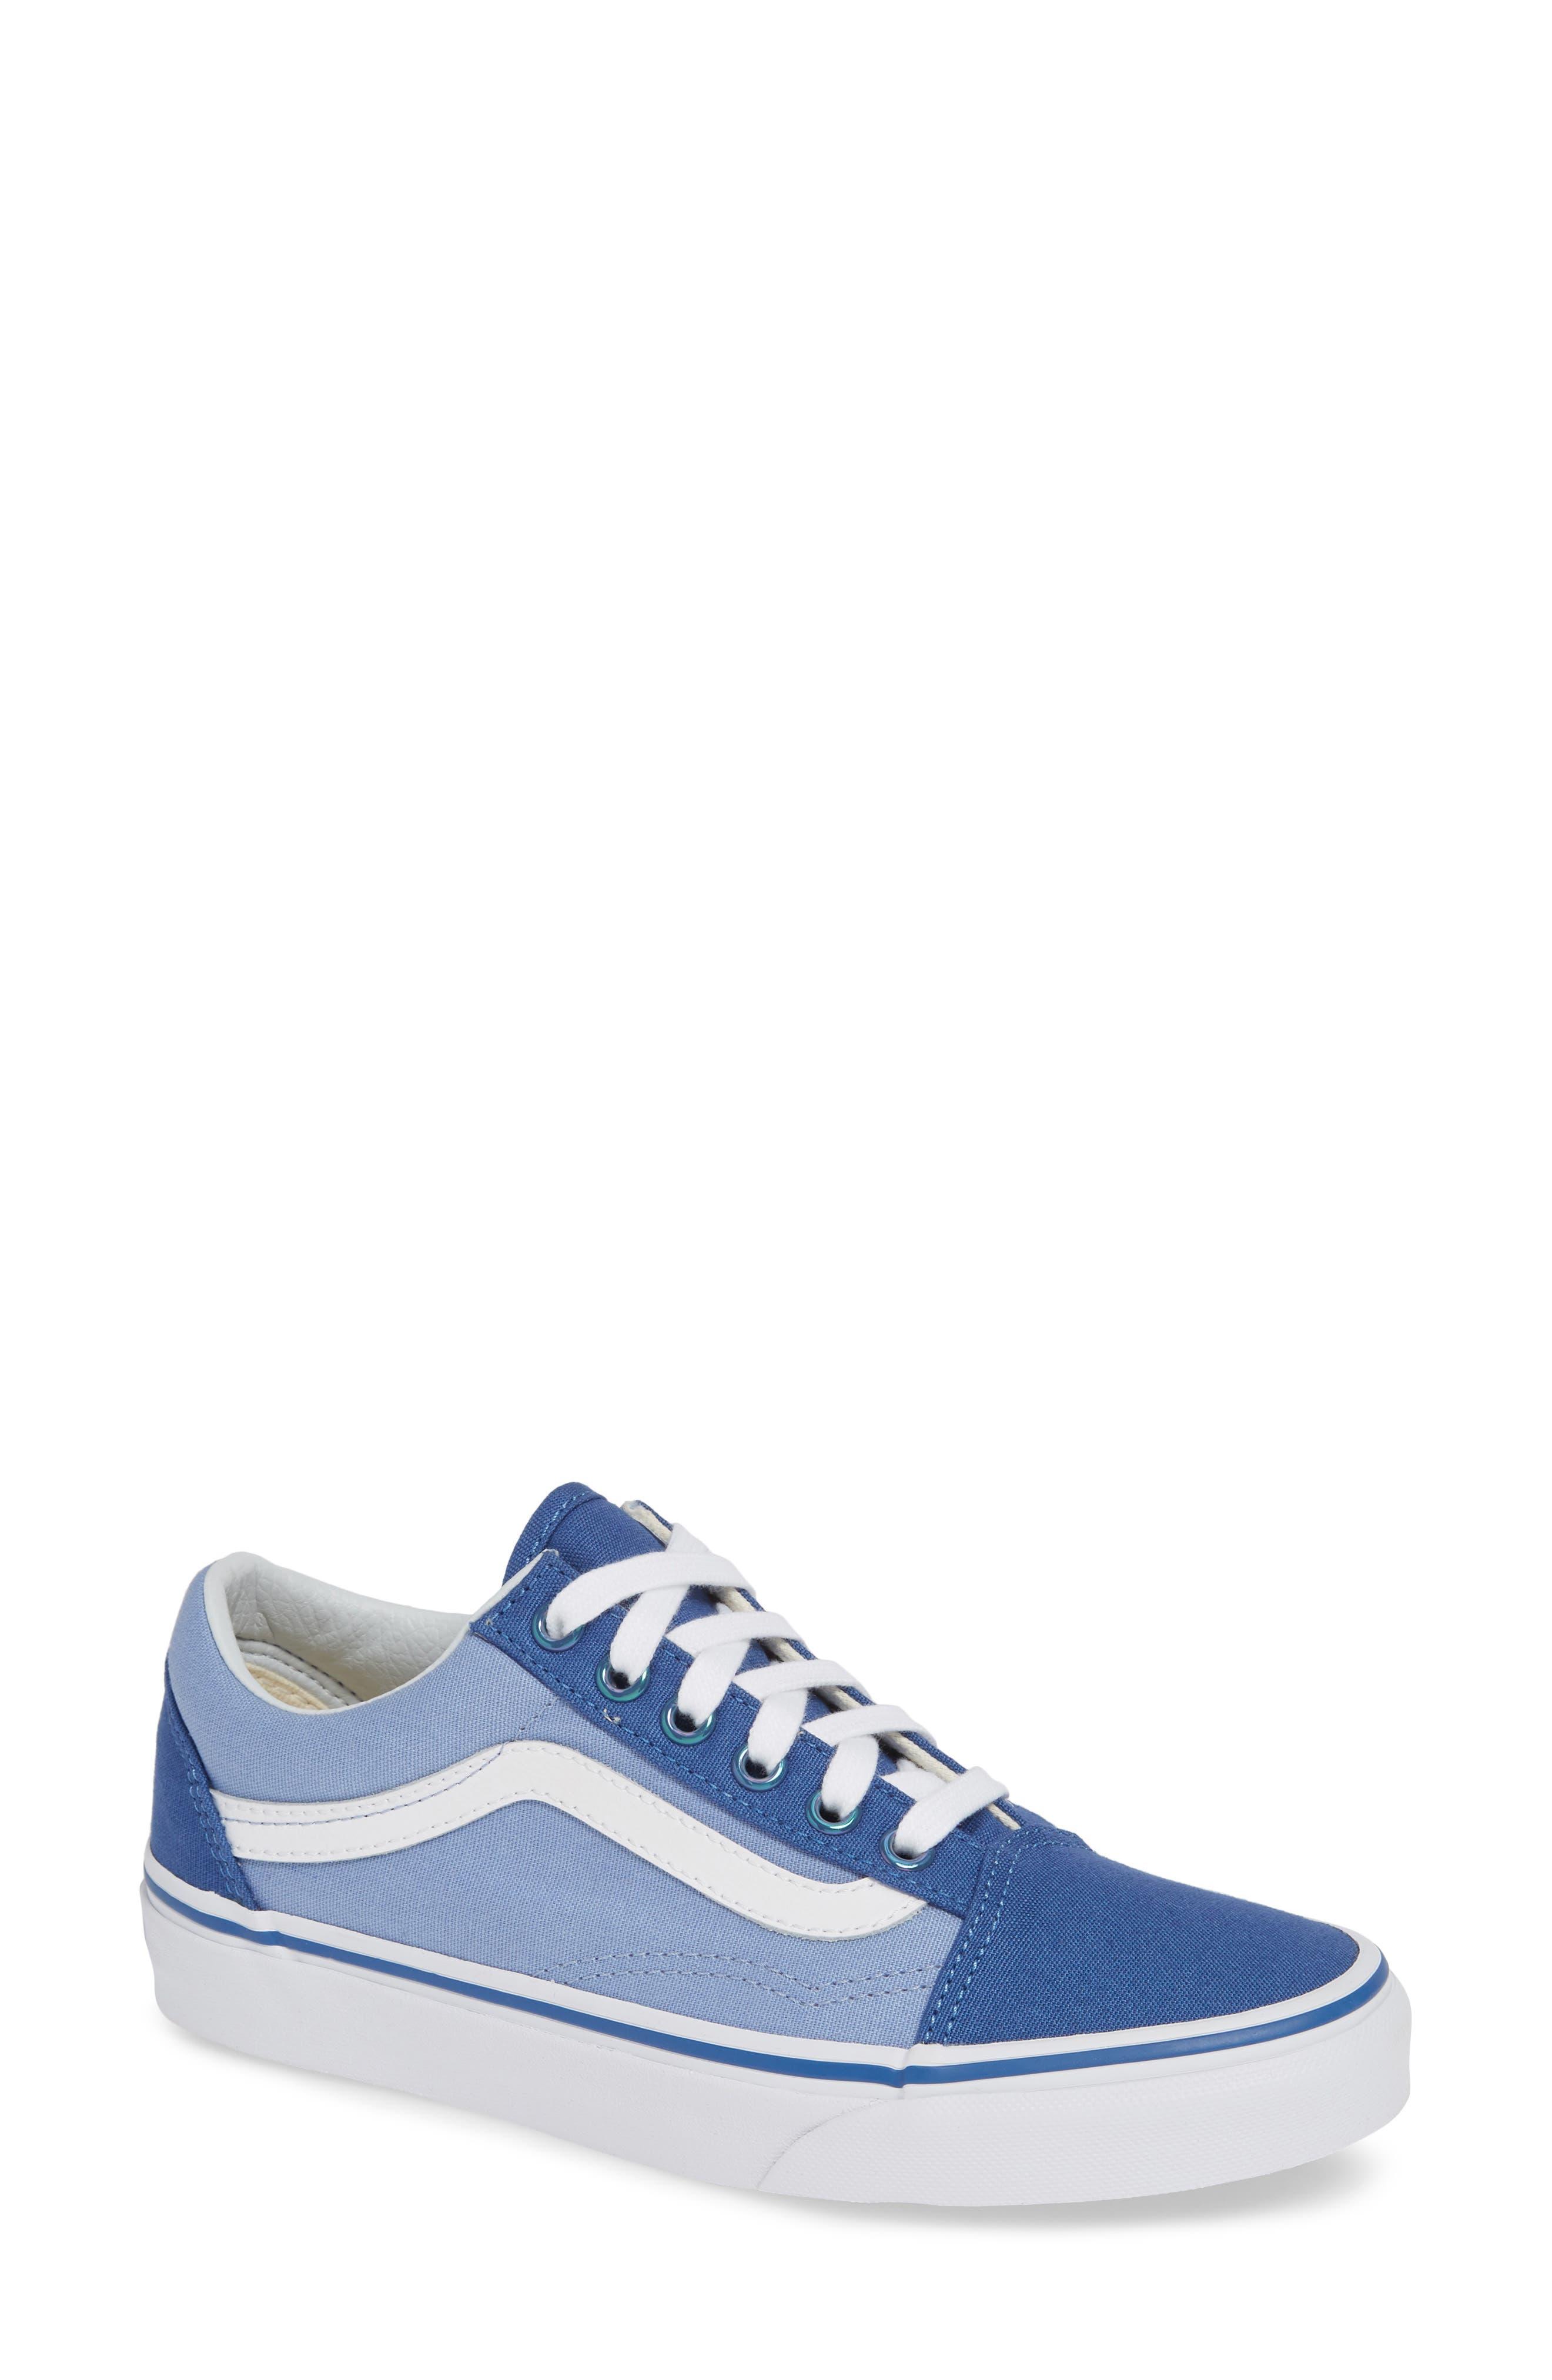 Old Skool Sneaker,                         Main,                         color, FEDERAL BLUE/ LAVENDER LUSTER